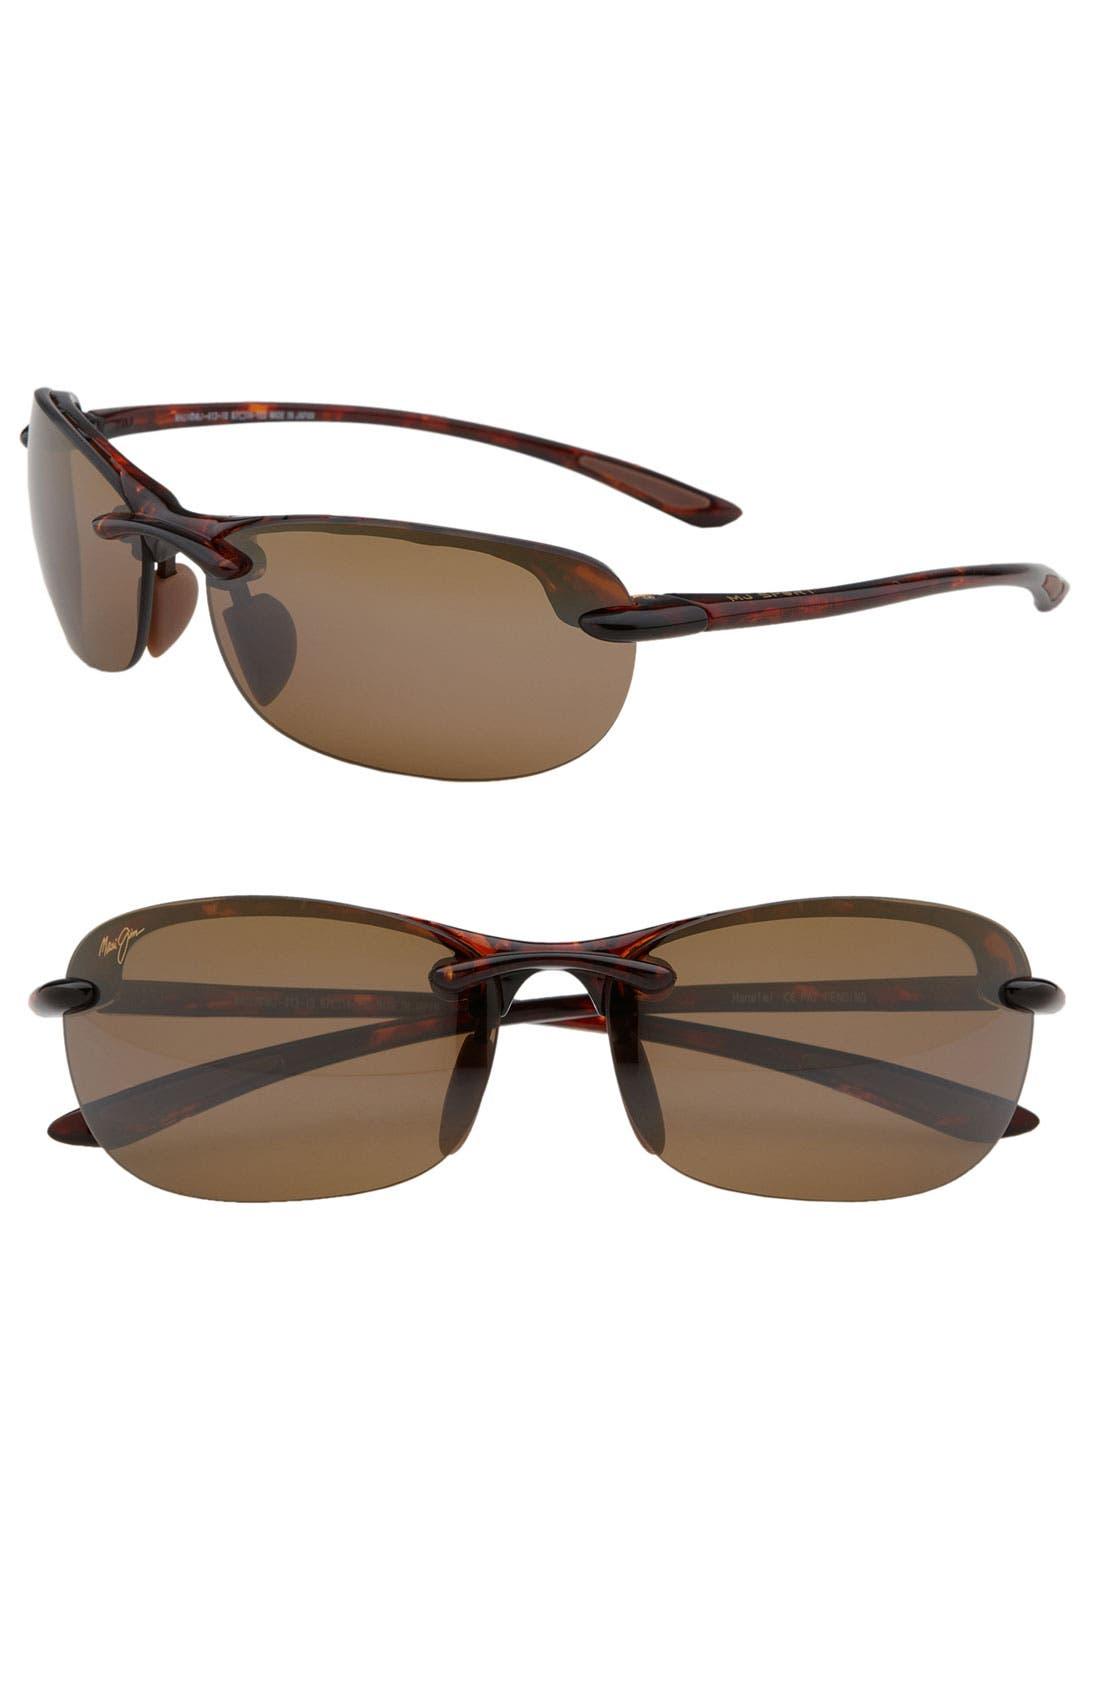 MAUI JIM Hanalei 64mm PolarizedPlus2® Rimless Sunglasses